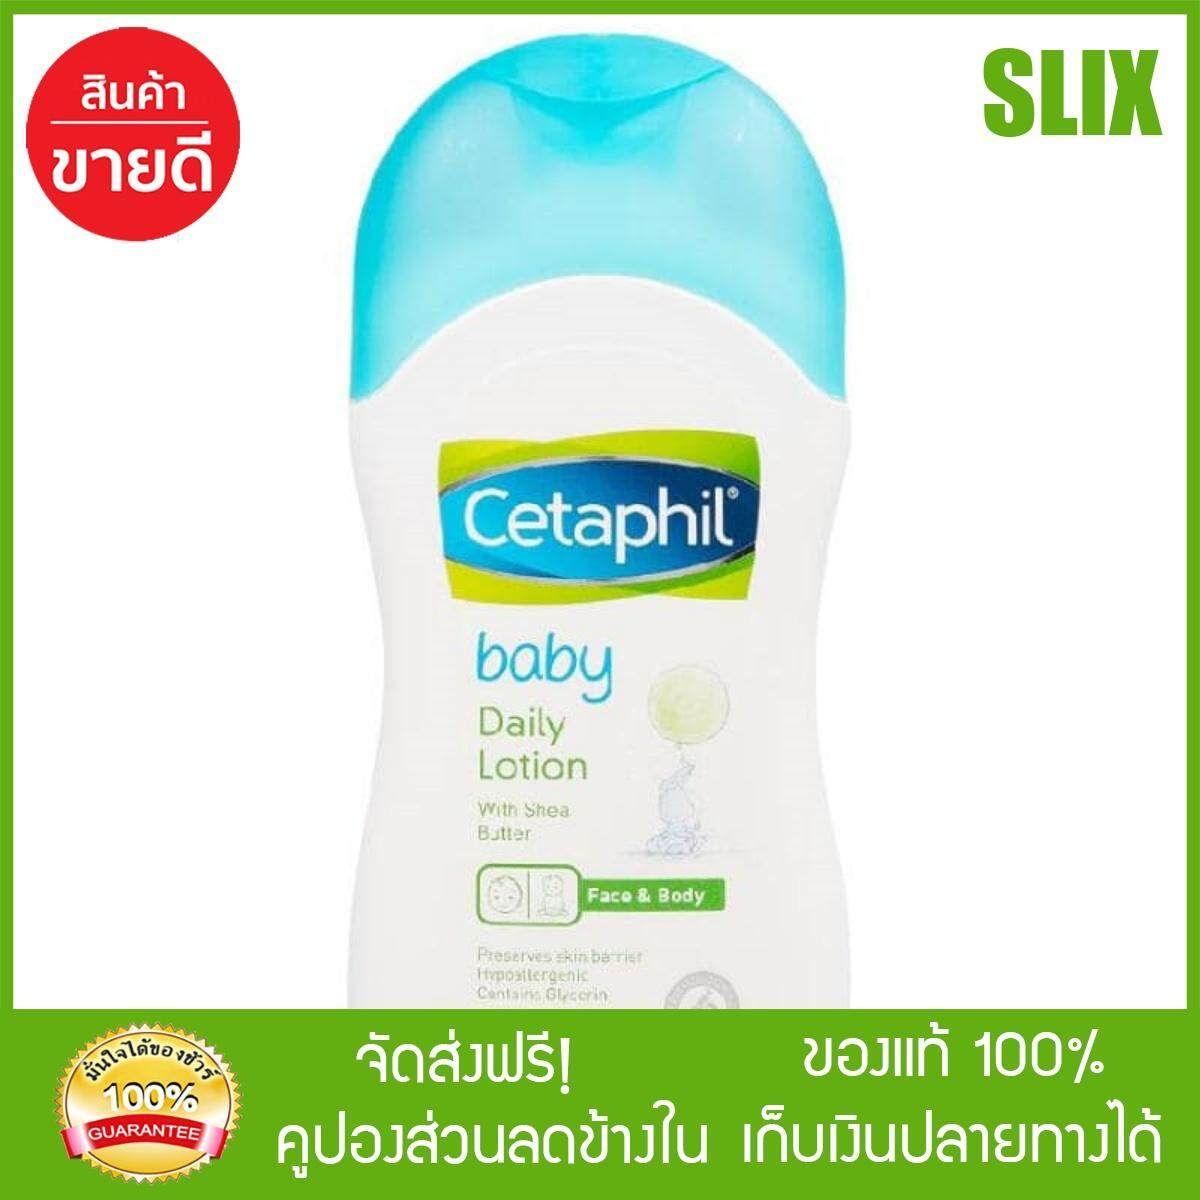 [Slix]- เซตาฟิล (Cetaphil) เบบี้ เดลี่ โลชั่น ผลิตภัณฑ์บำรุงผิวสำหรับเด็ก 400 มล. ครีมทาผิวเด็ก โลชั่นเด็ก baby lotion ส่ง Kerry เก็บปลายทางได้